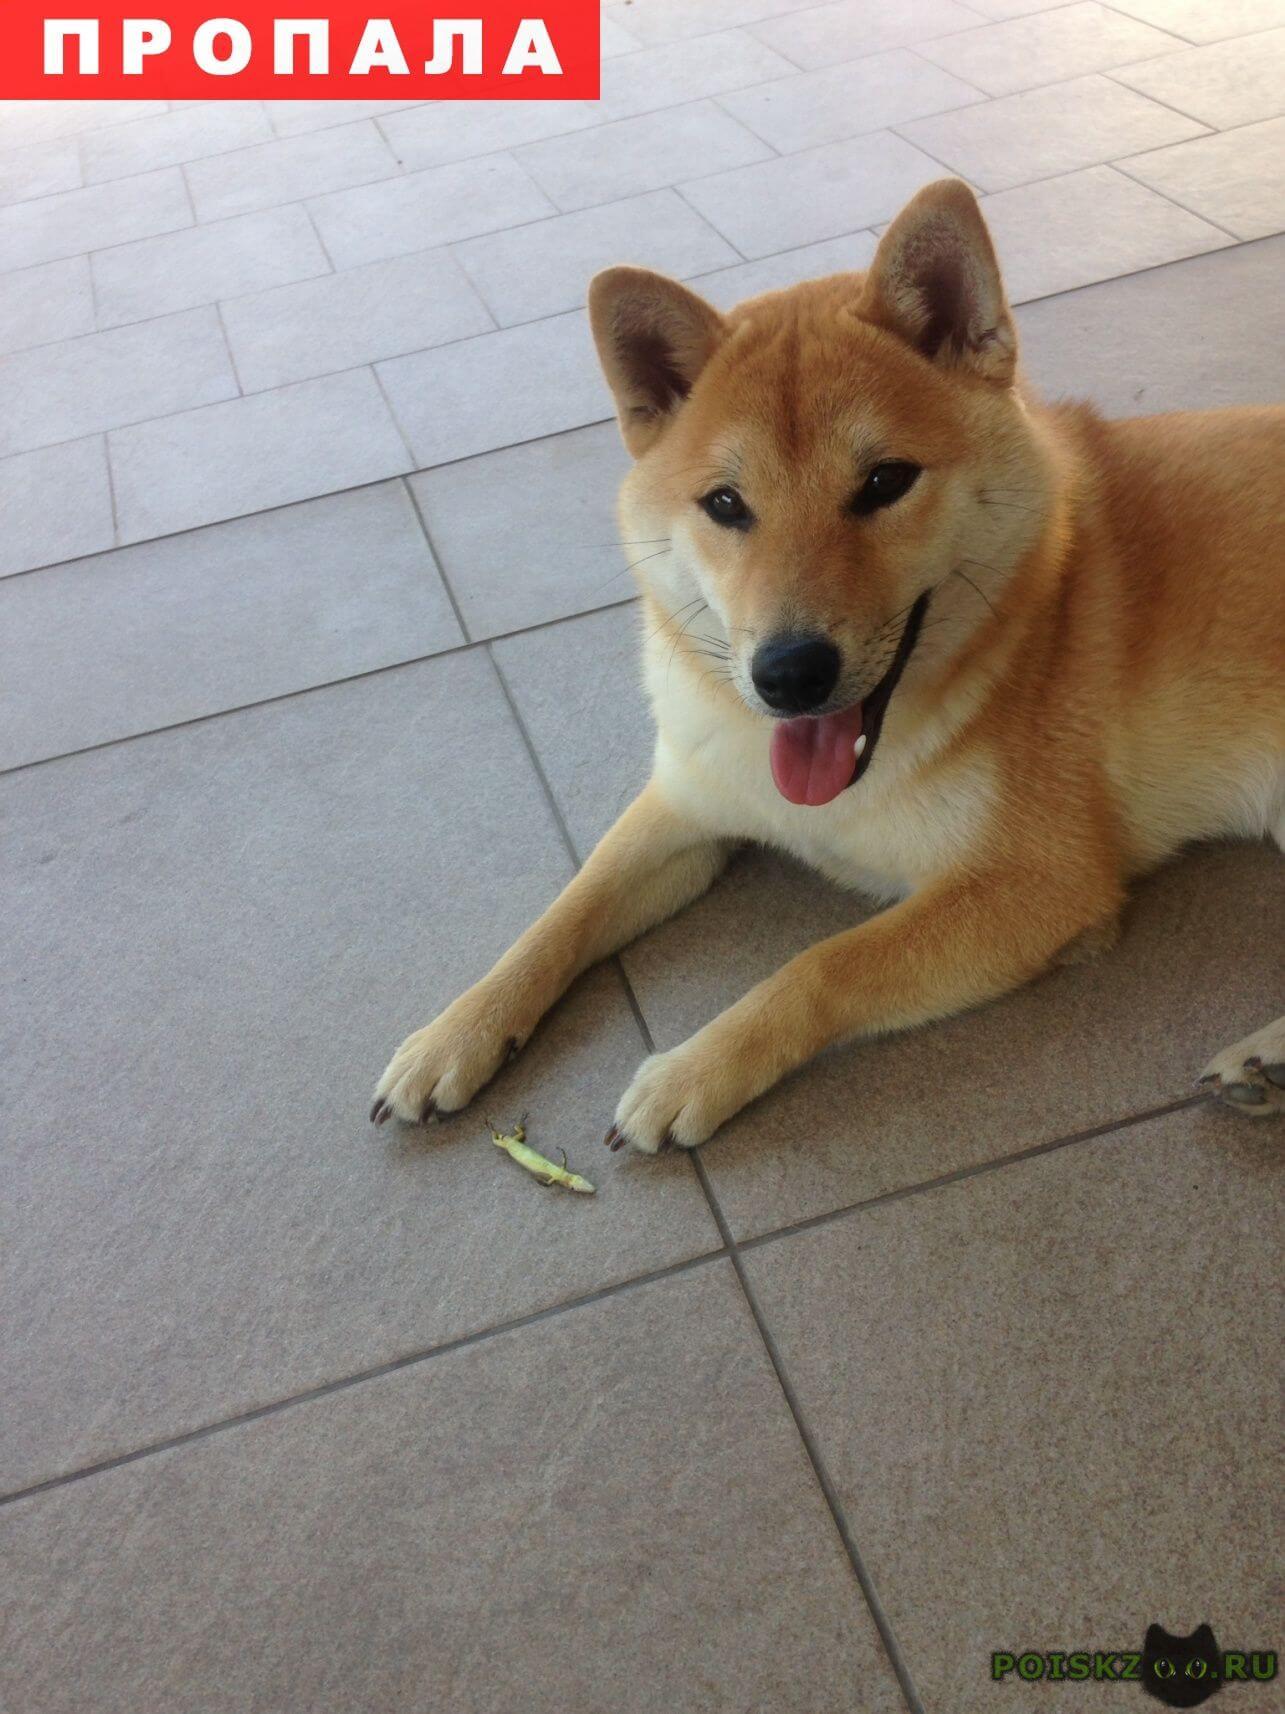 Пропала собака сибу ину. рыжий лисёнок. г.Краснодар